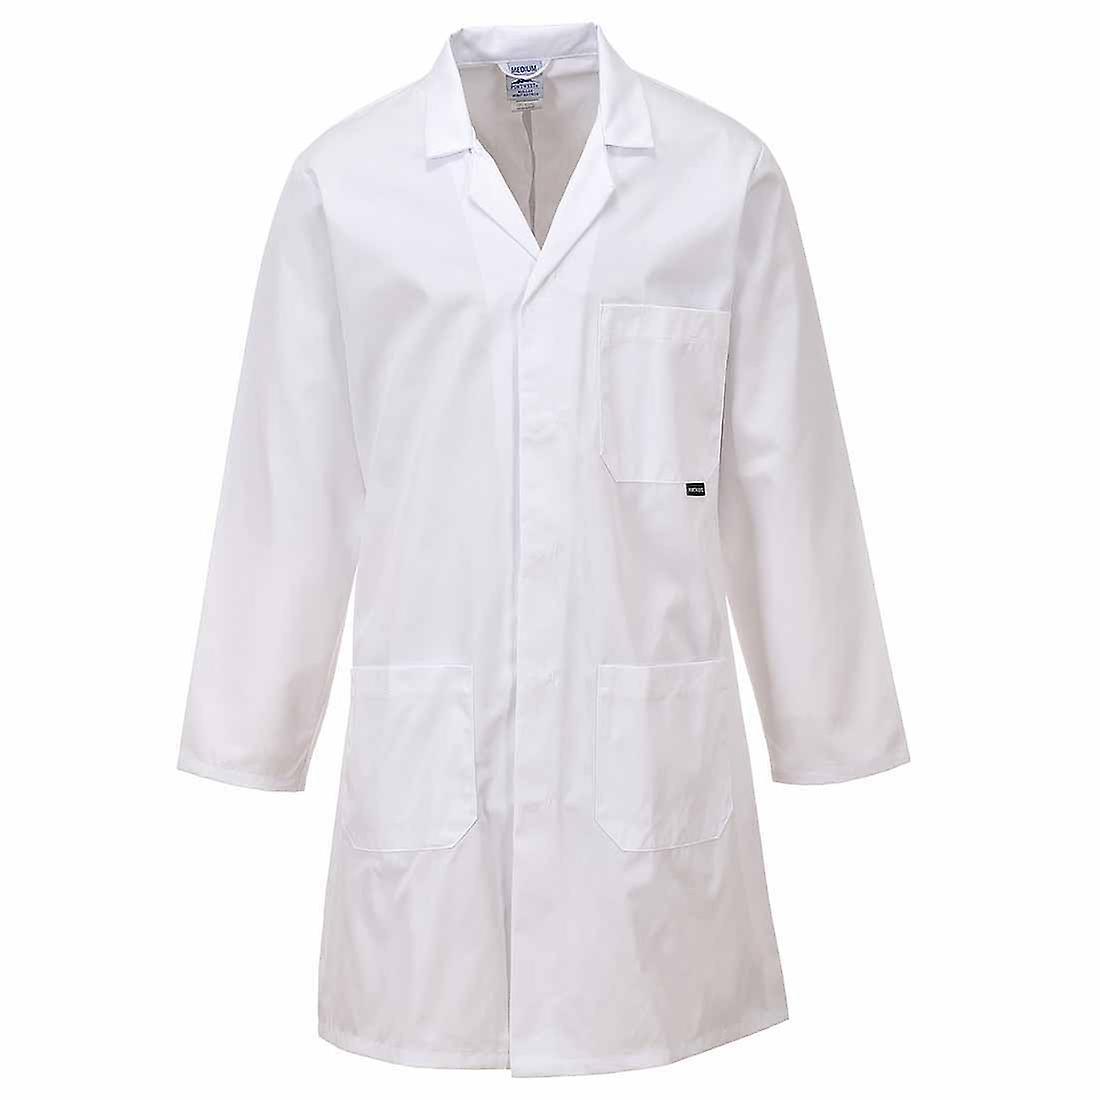 Portwest - Workwear Standard Lab - Medical-Food Prep Coat Polycotton